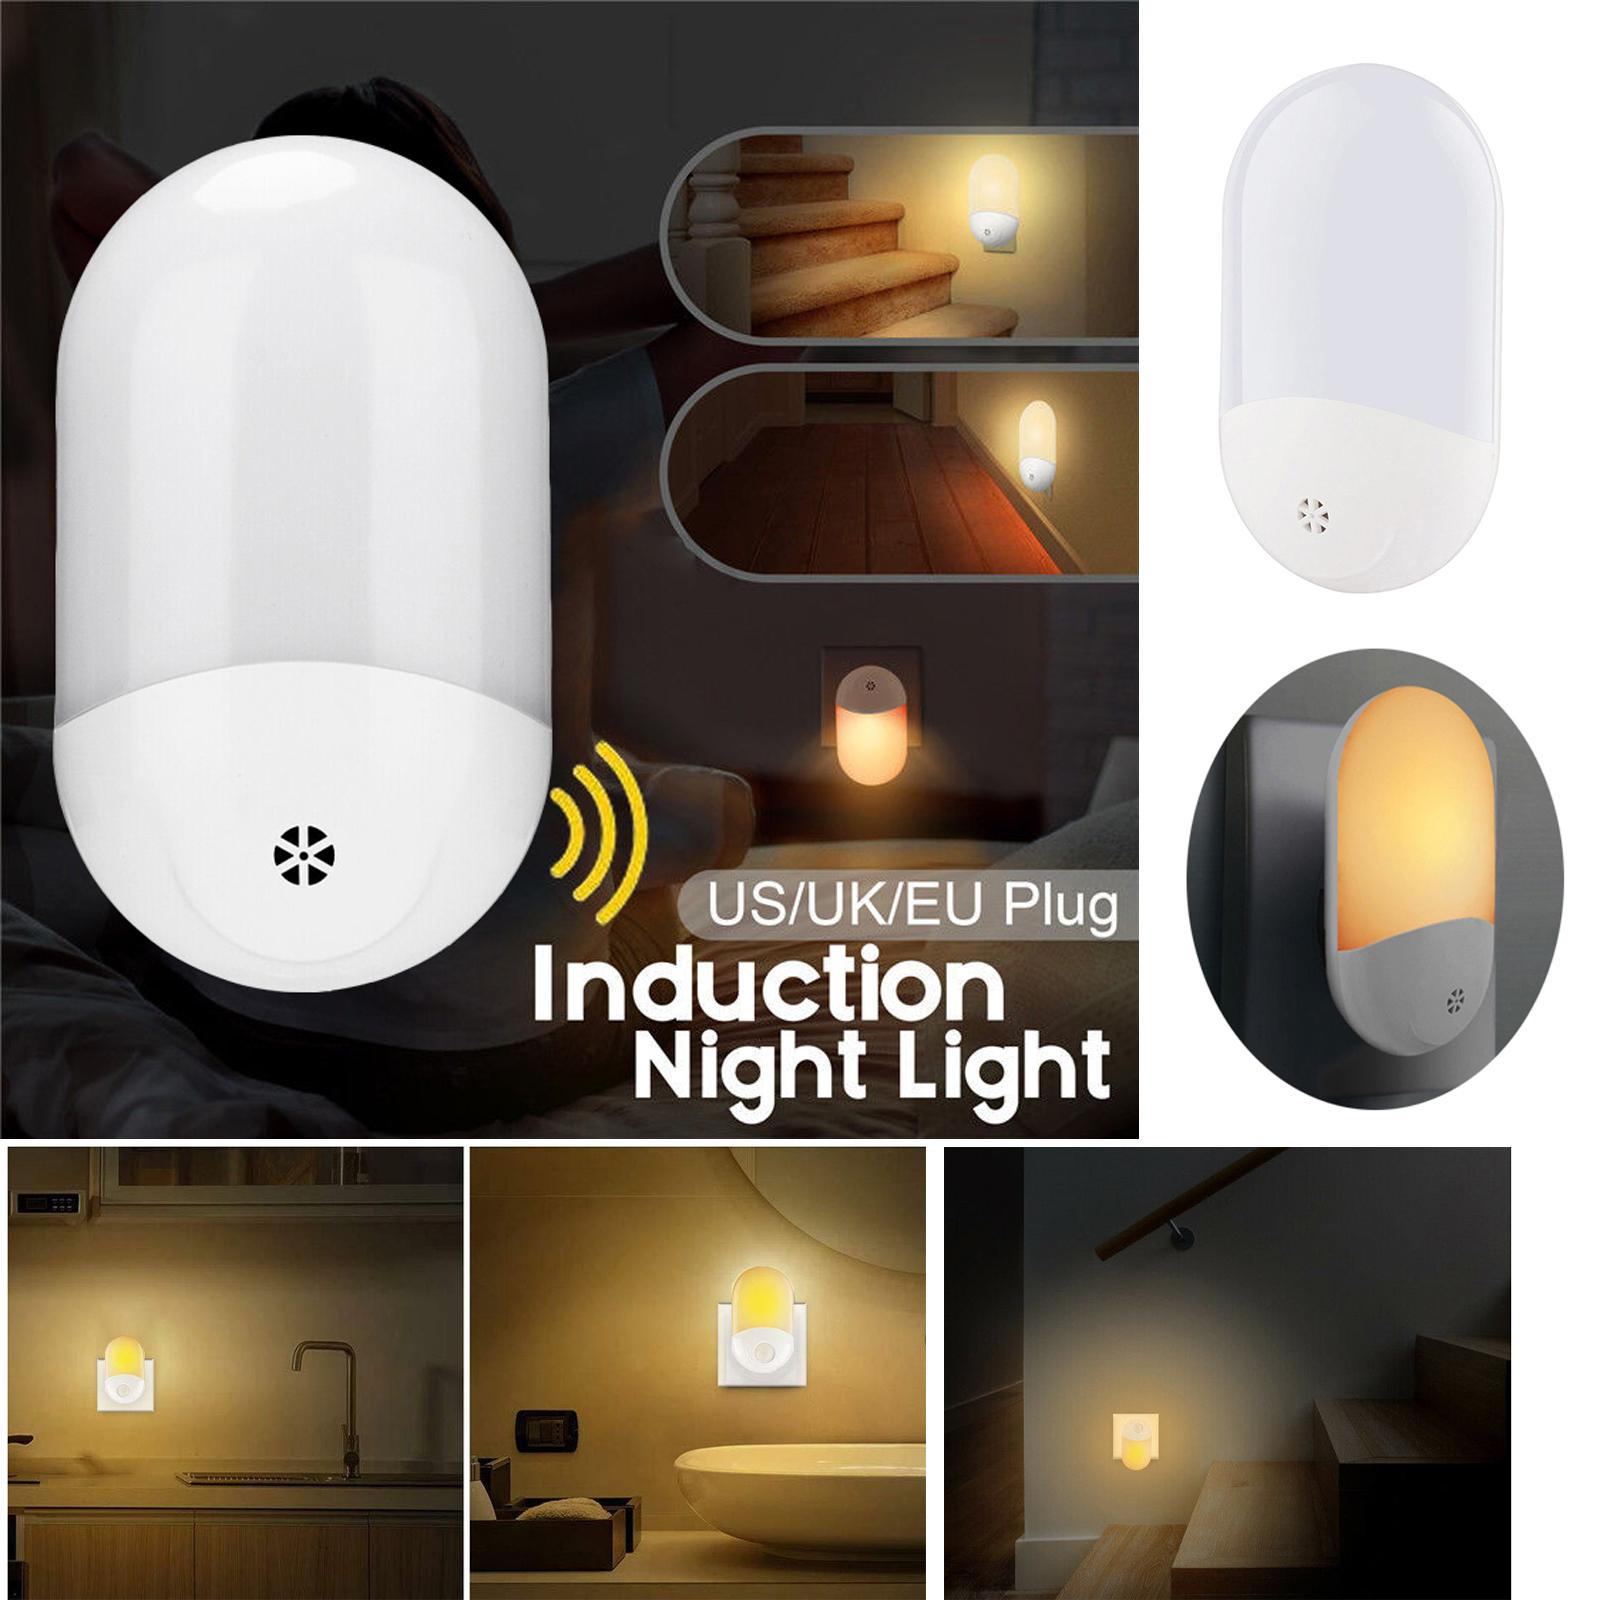 Built-in Sensitive Light Sensor 2LED Night Light Warm White Bedroom Wall Plug-in